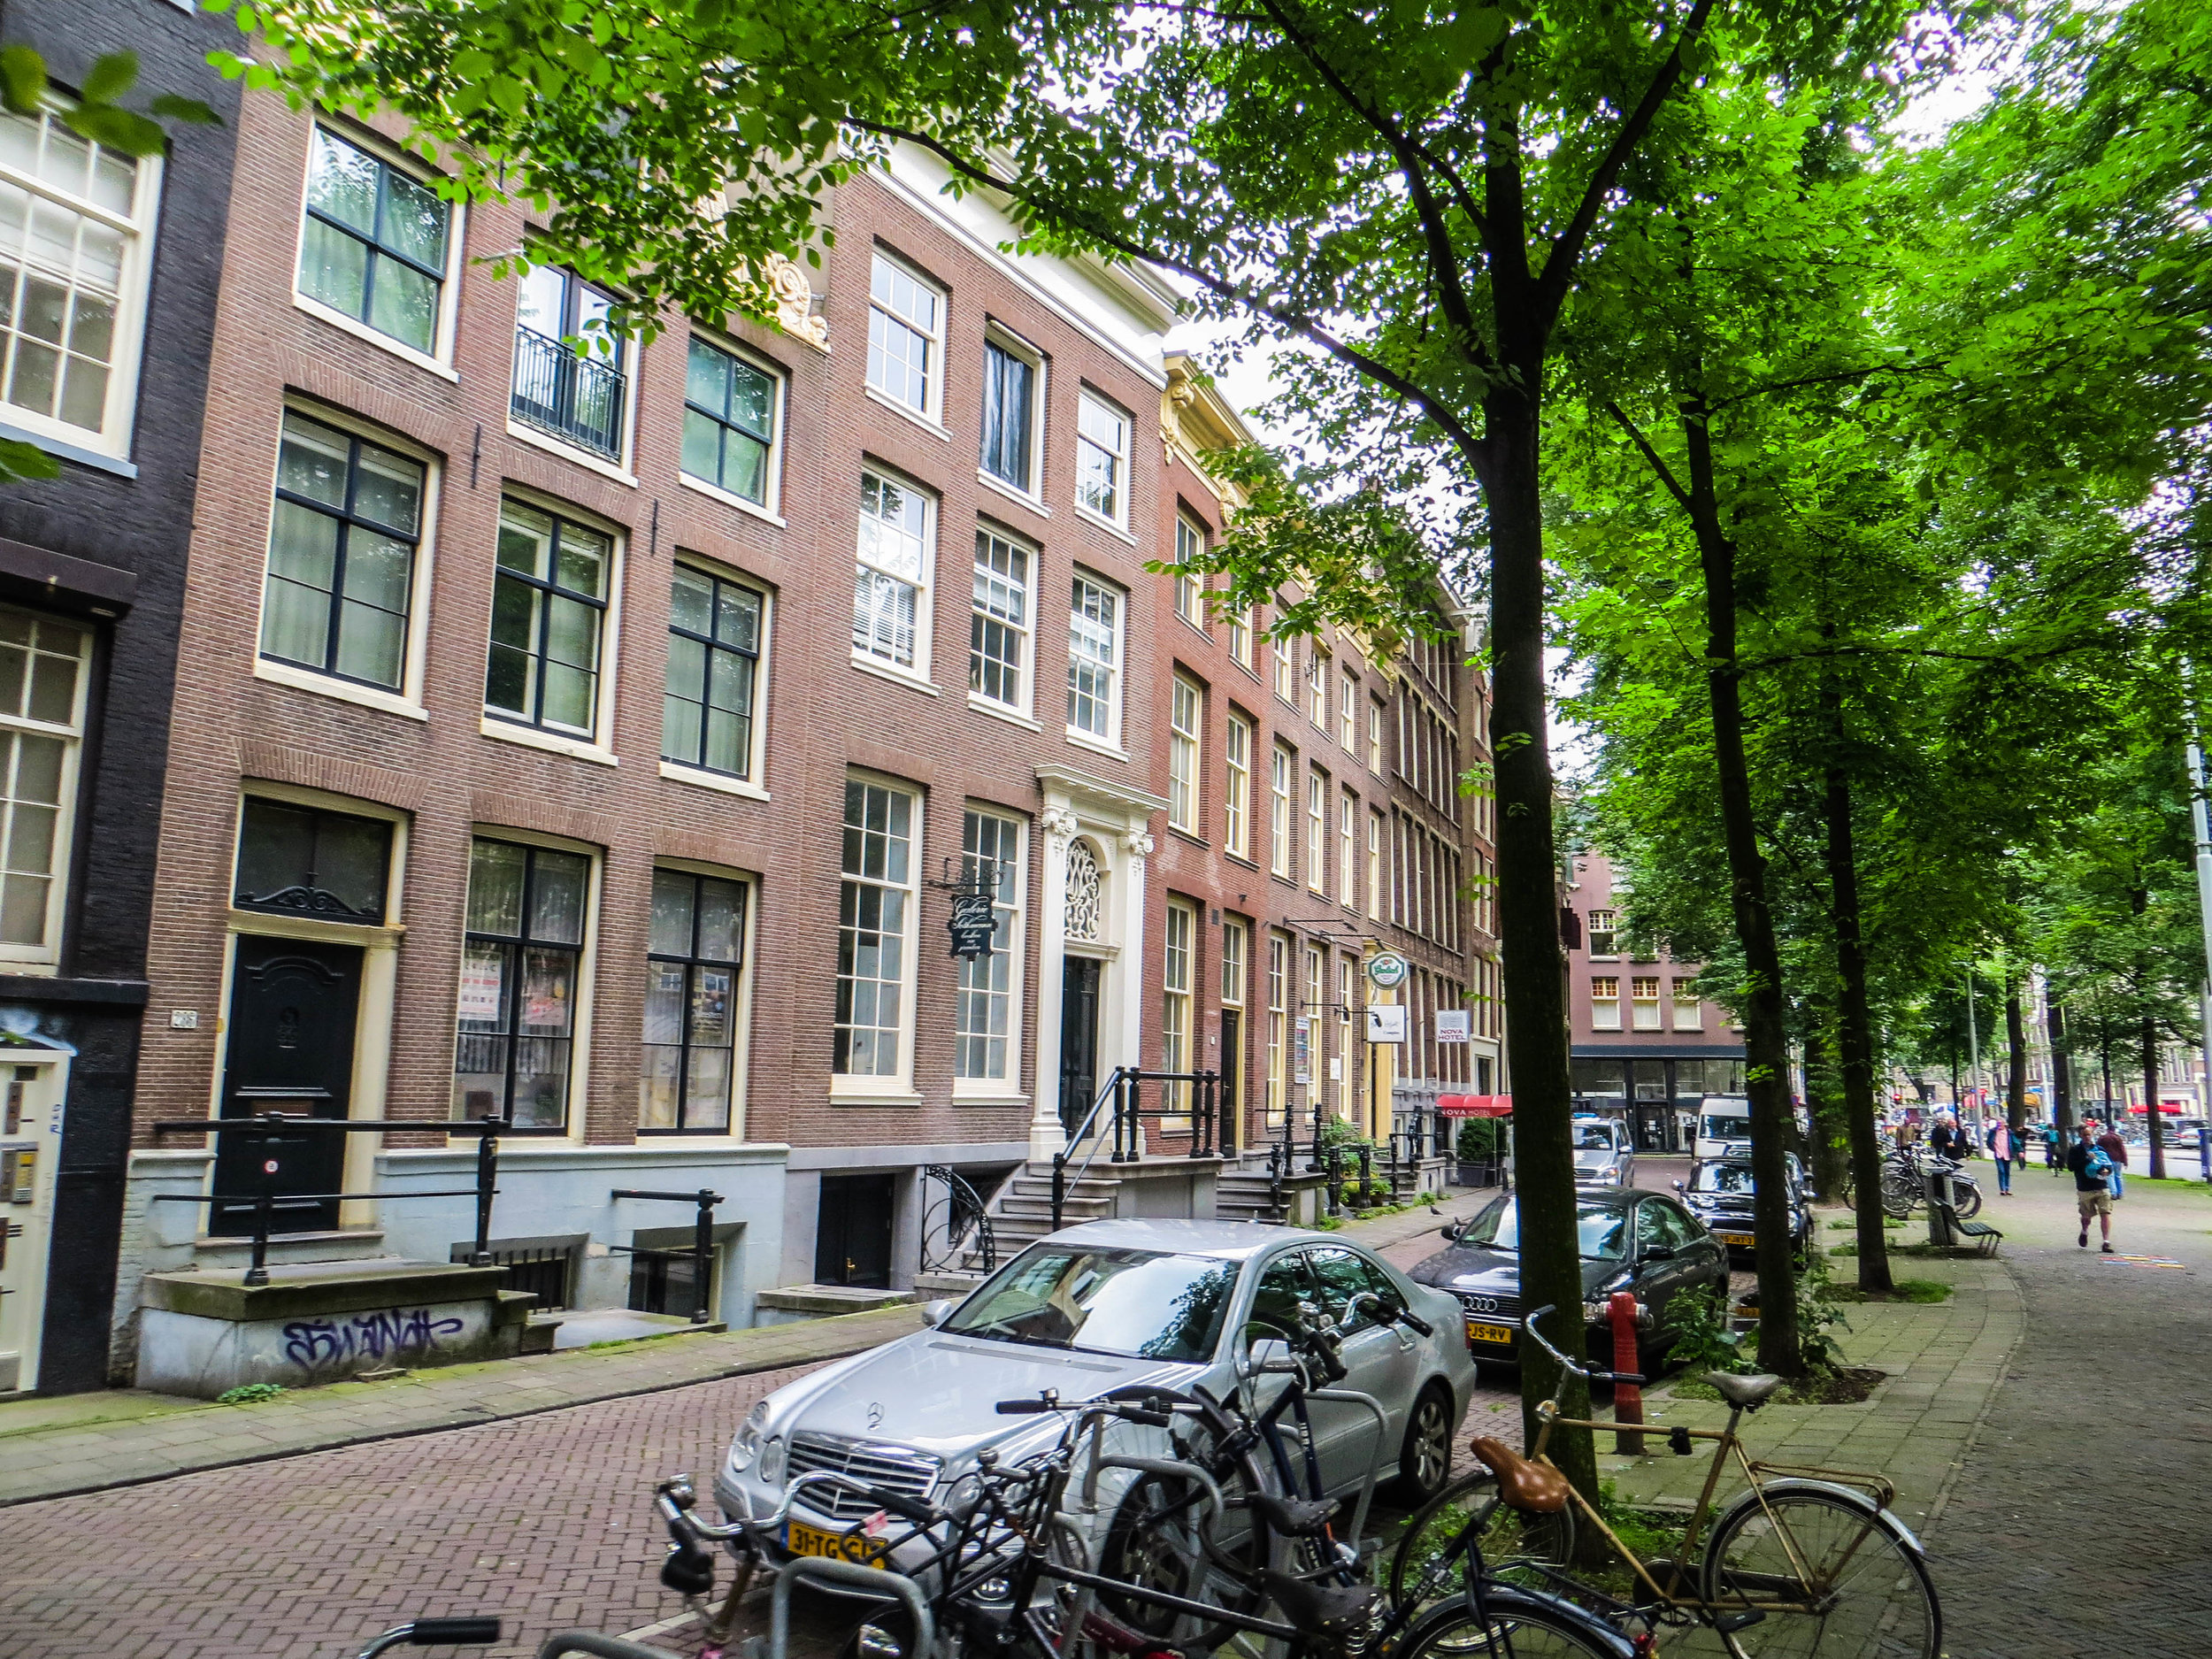 amsterdam-netherlands-street-photography-15.jpg